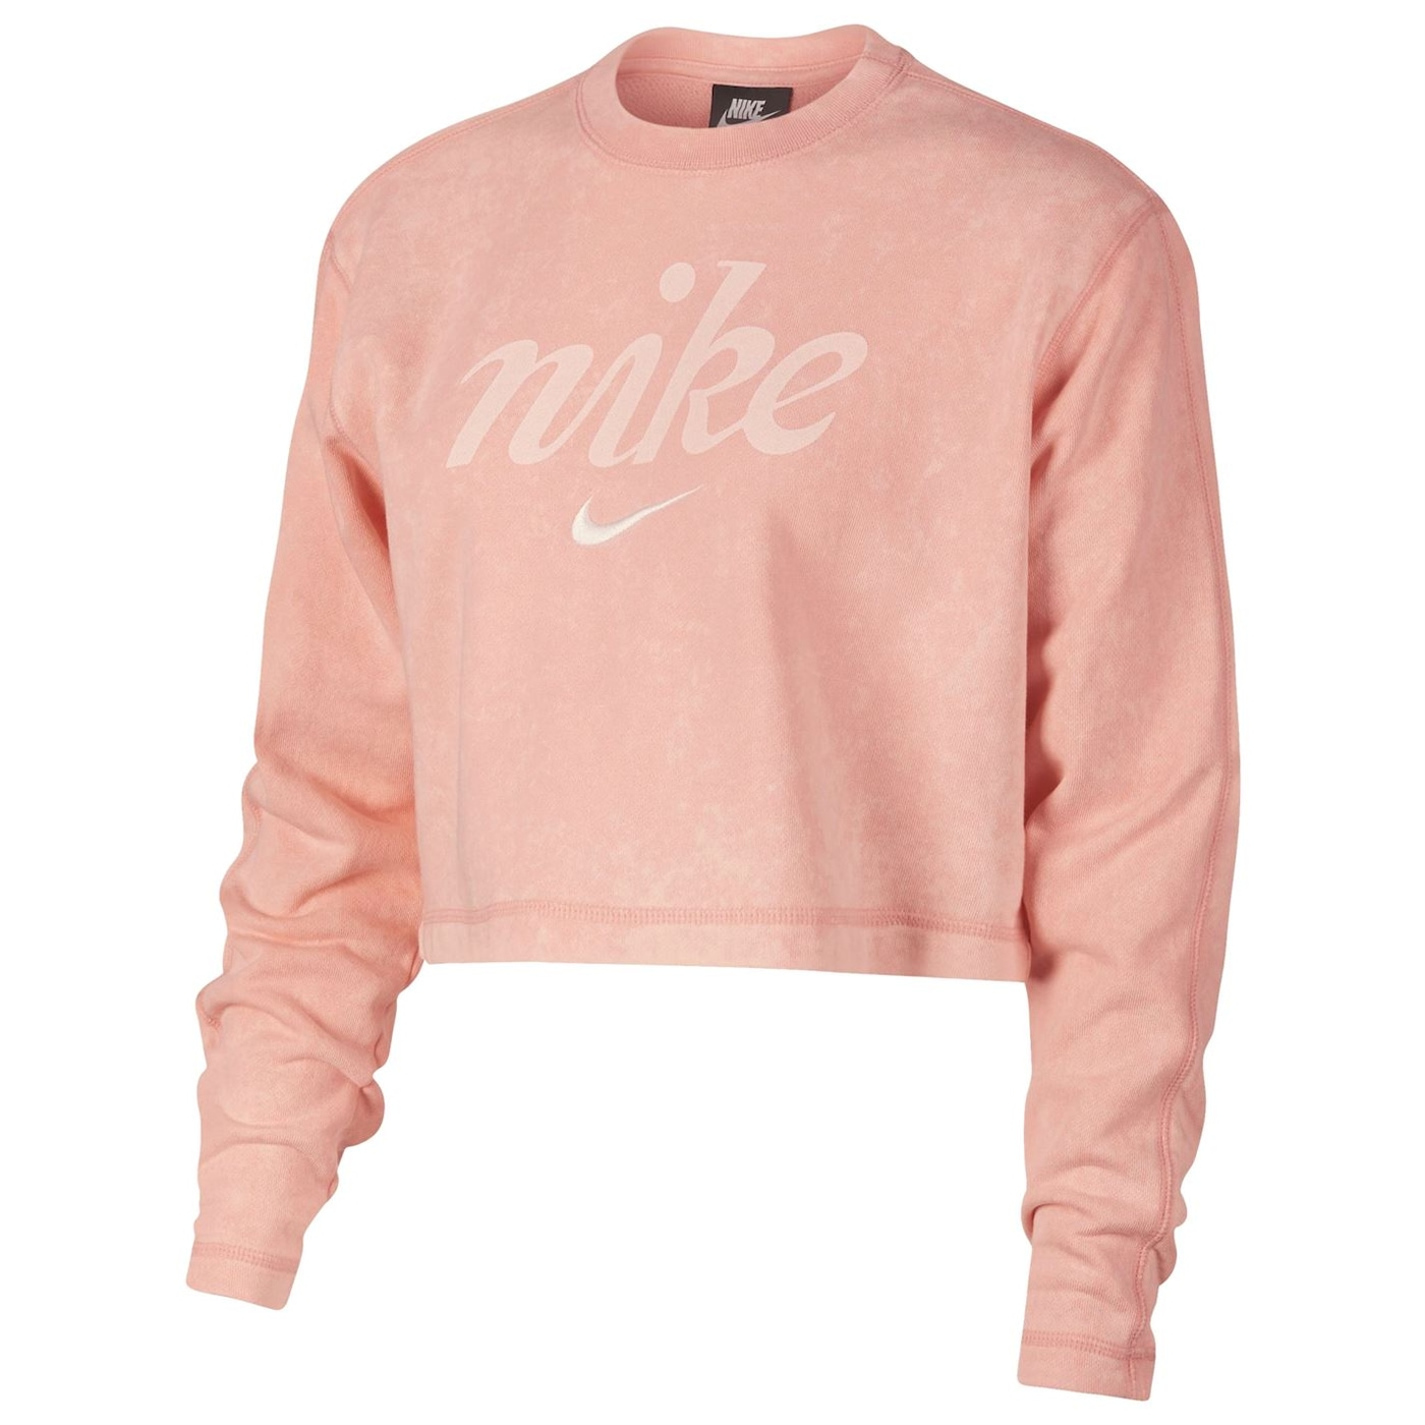 Nike Washed Crop Sweatshirt Ladies